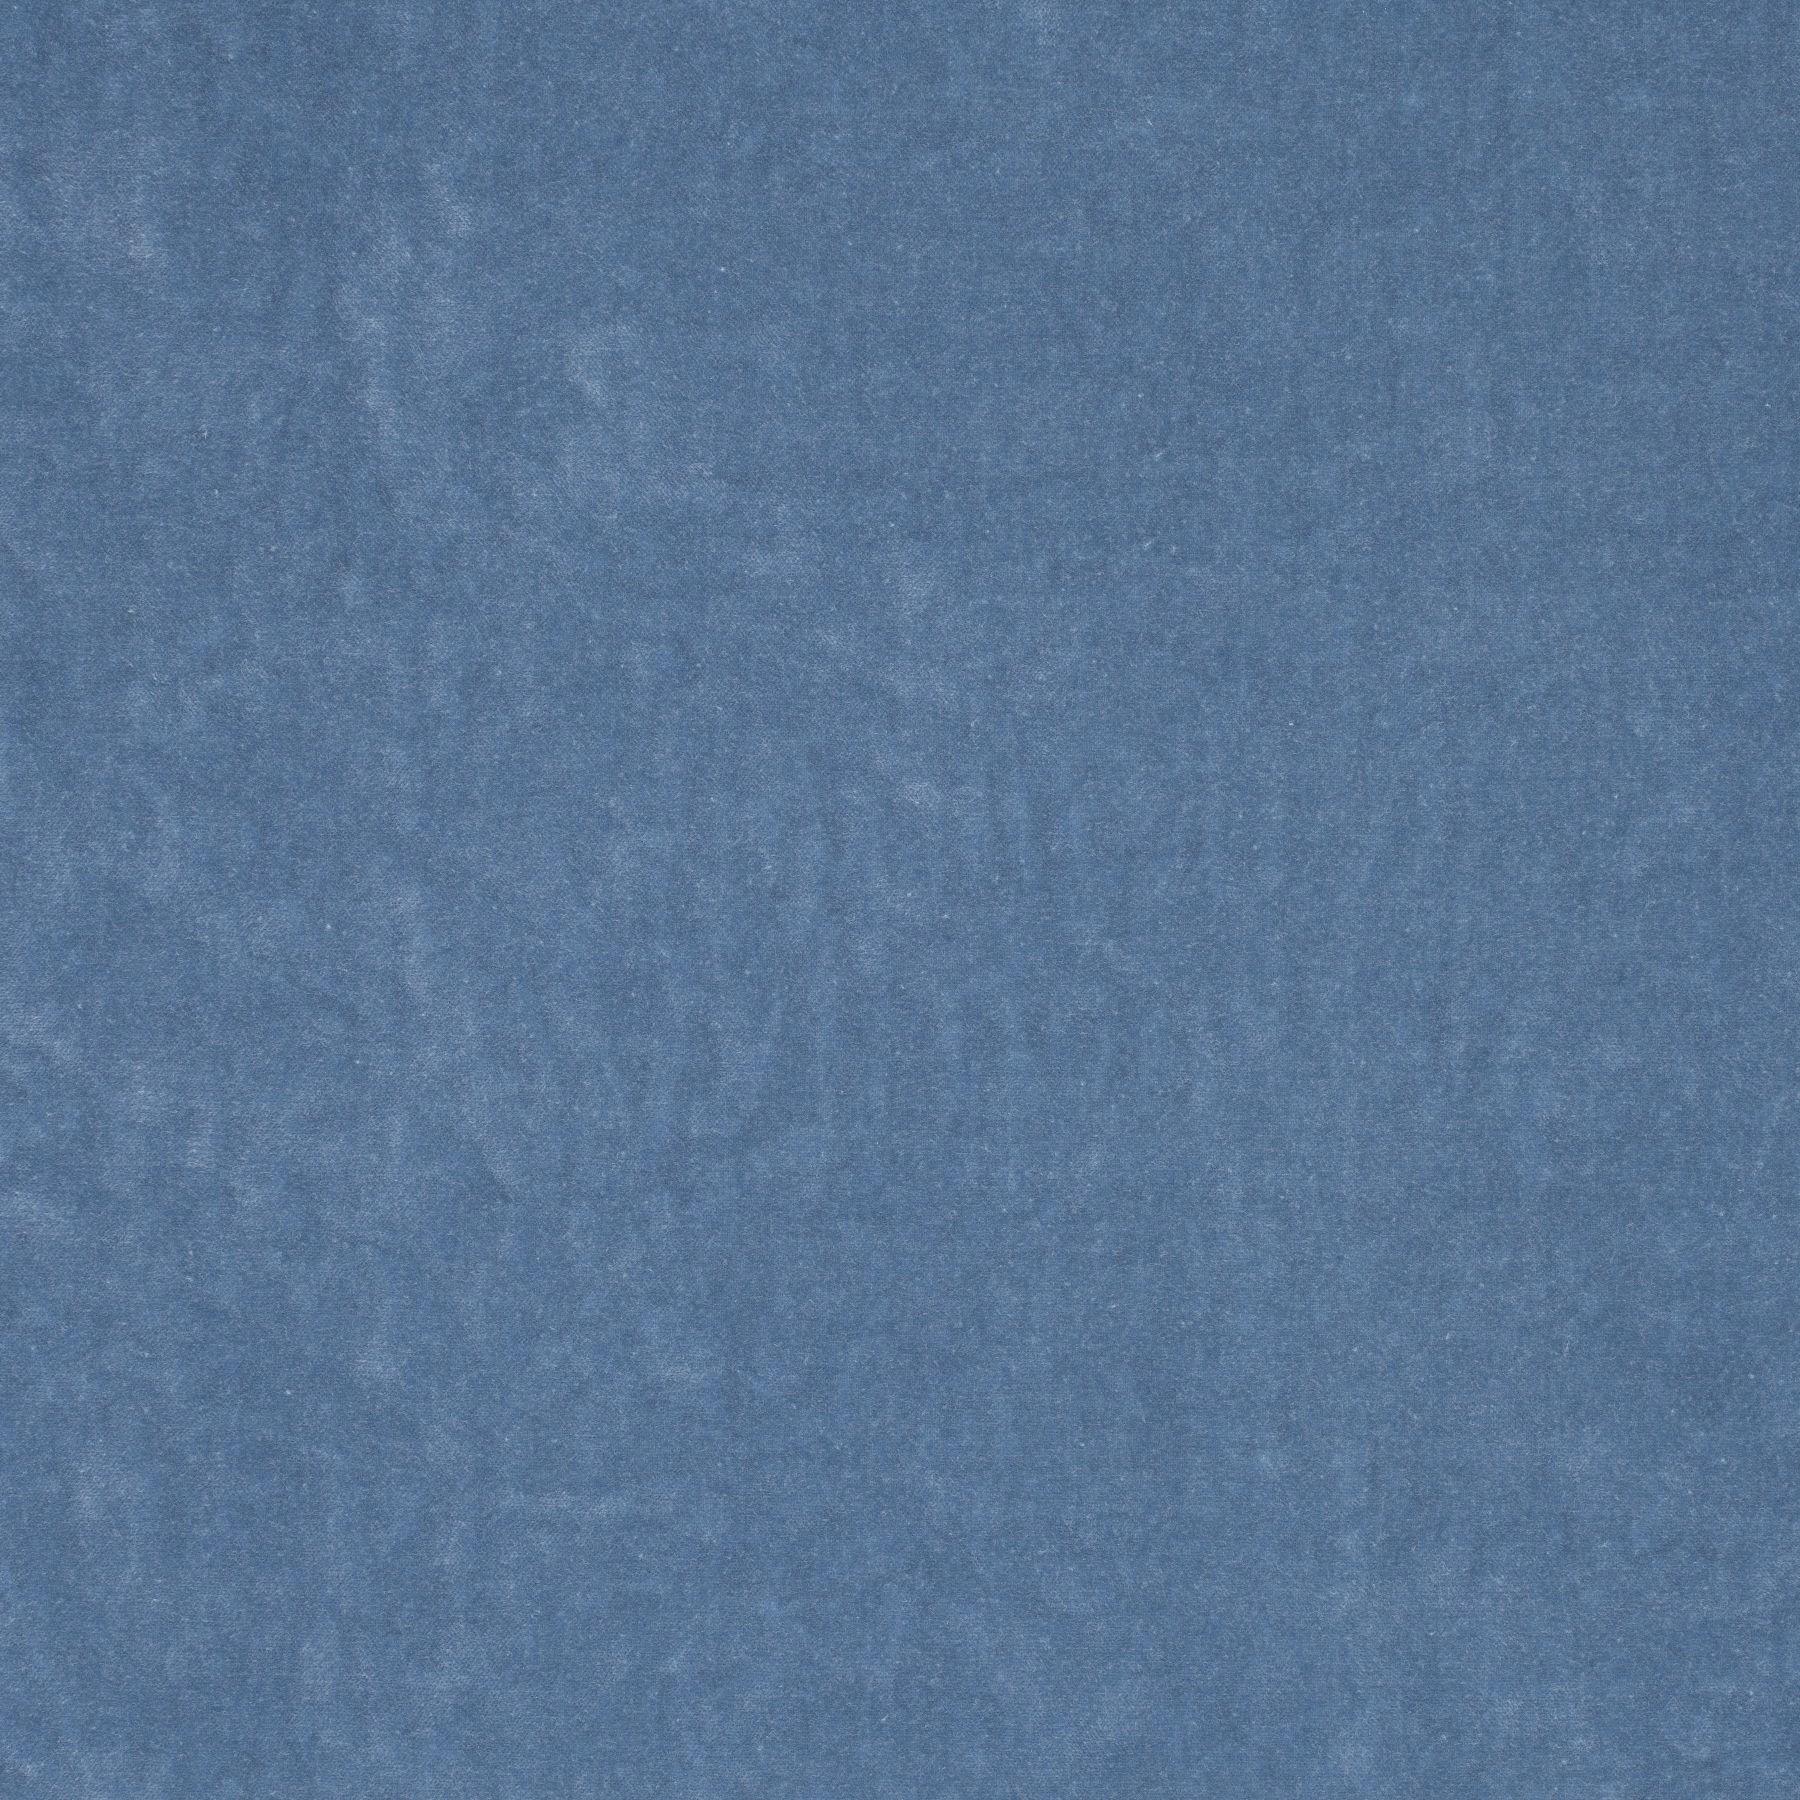 upholstery fabric excellence 1 3122 051 jab anstoetz. Black Bedroom Furniture Sets. Home Design Ideas